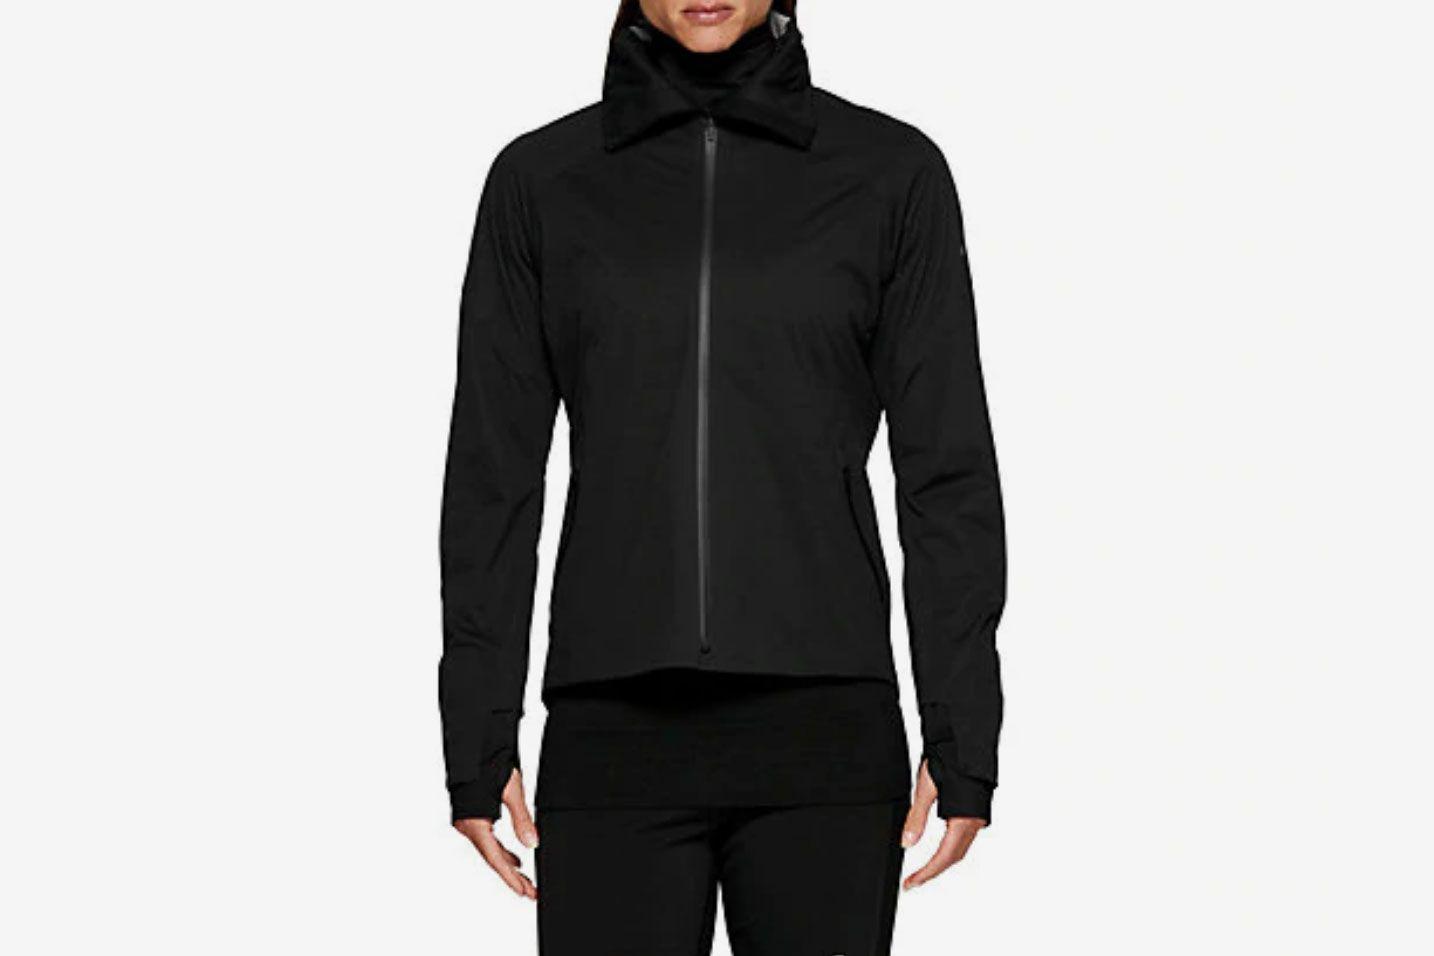 Asics Women's Fall Metarun Winter Jacket